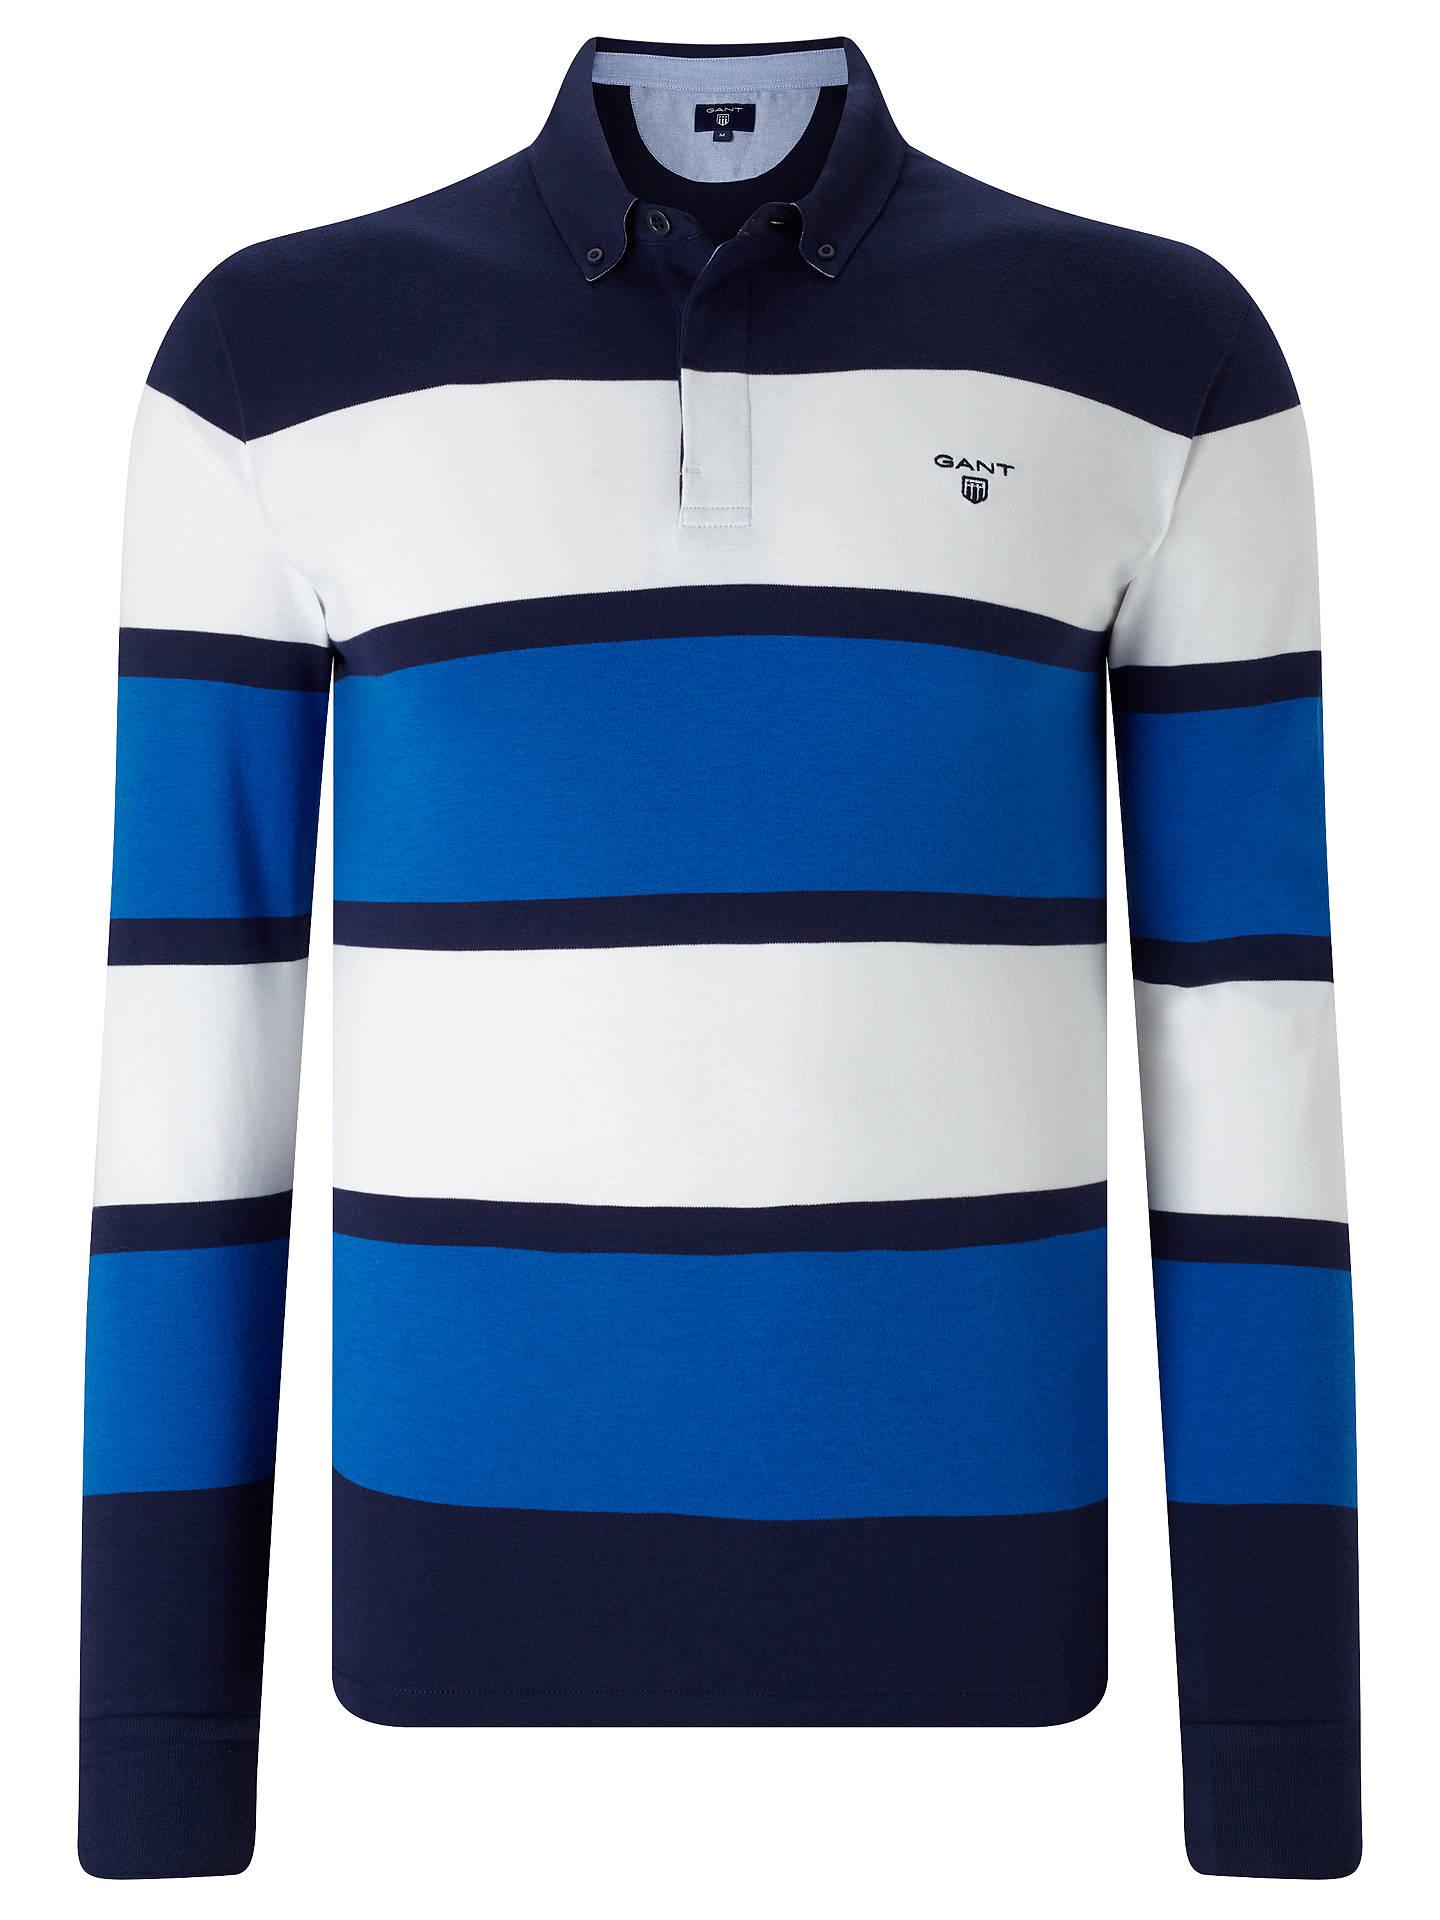 Helpful Gant Xl Rugby Top Shirts & Tops